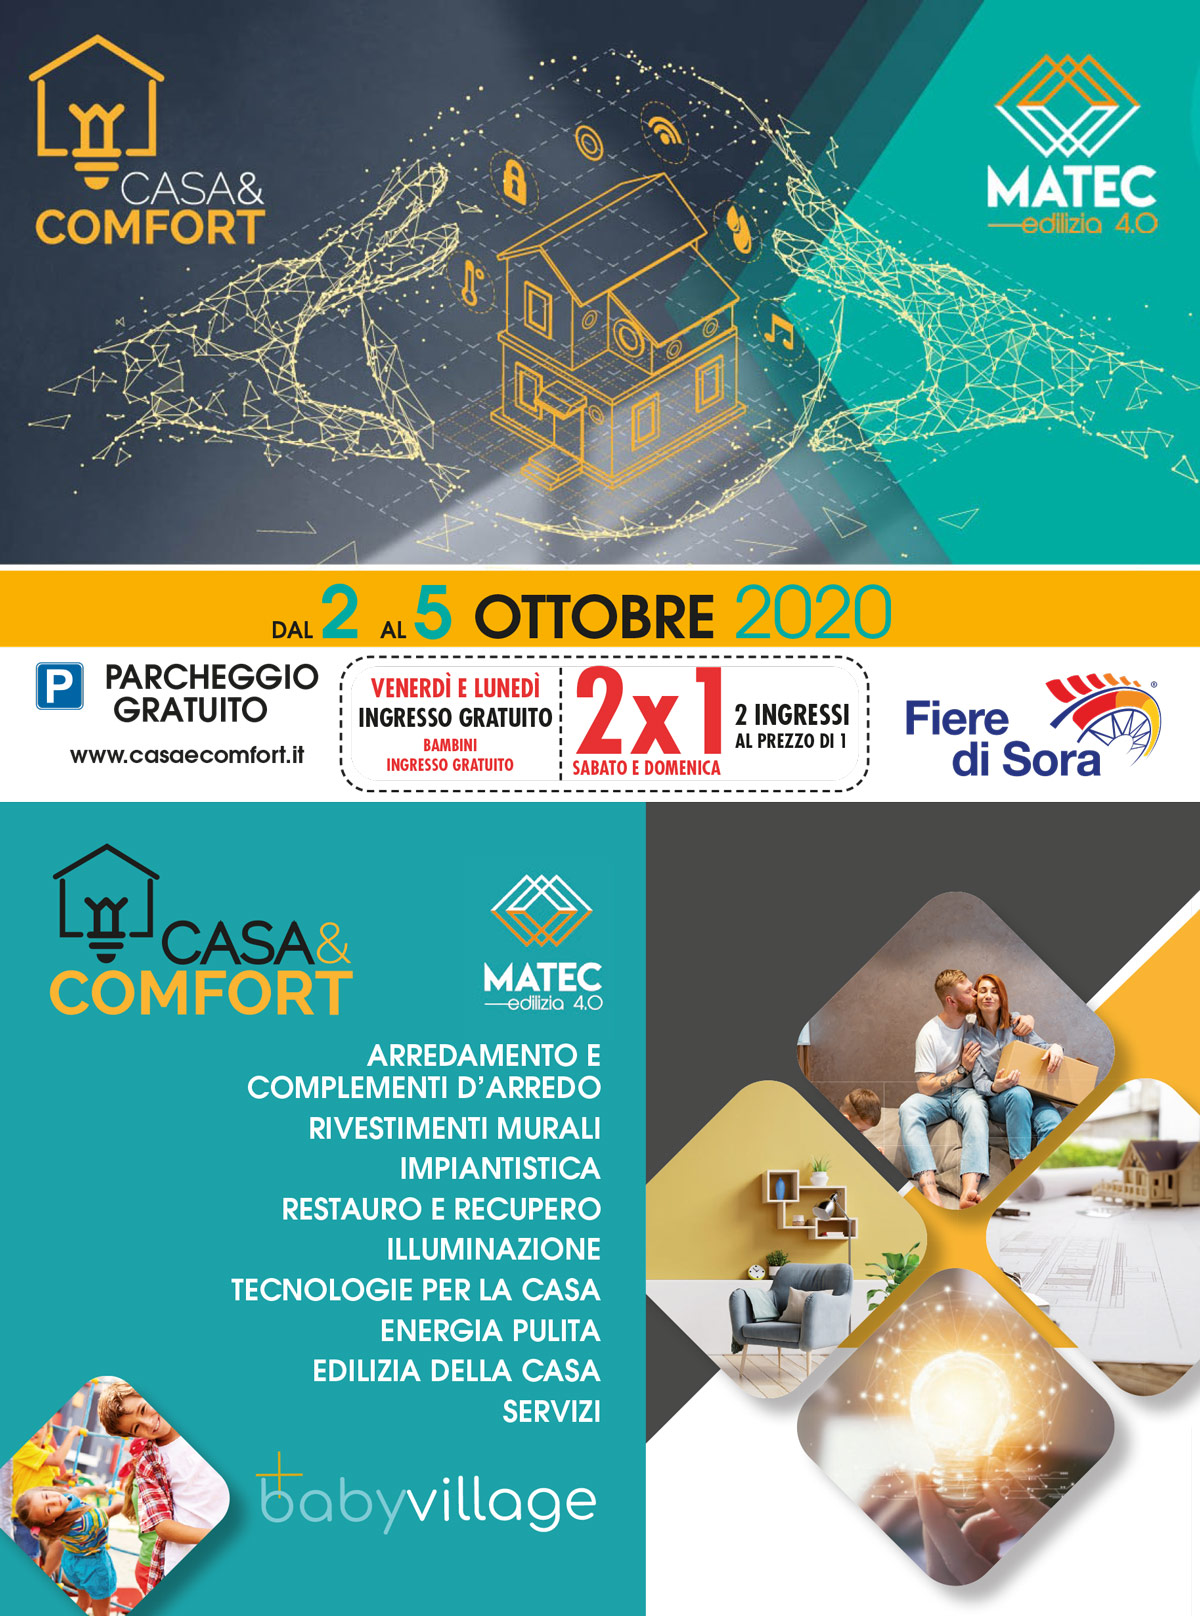 casaecomfort-fiera-matec-edilizia-ottobre-2020